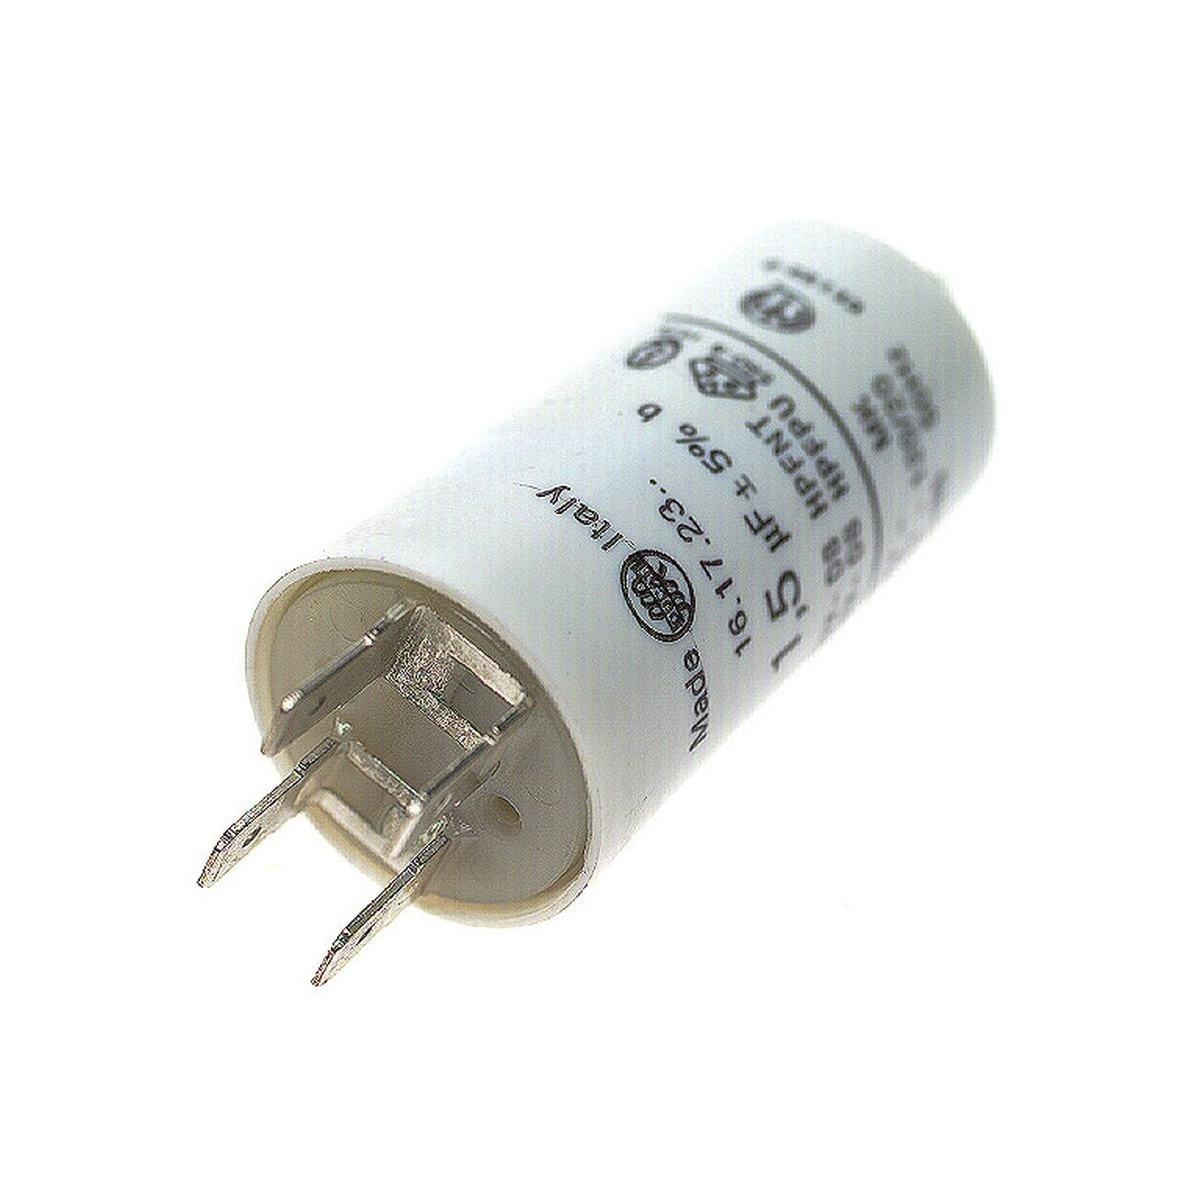 Kondensator 4,0 µF 450V